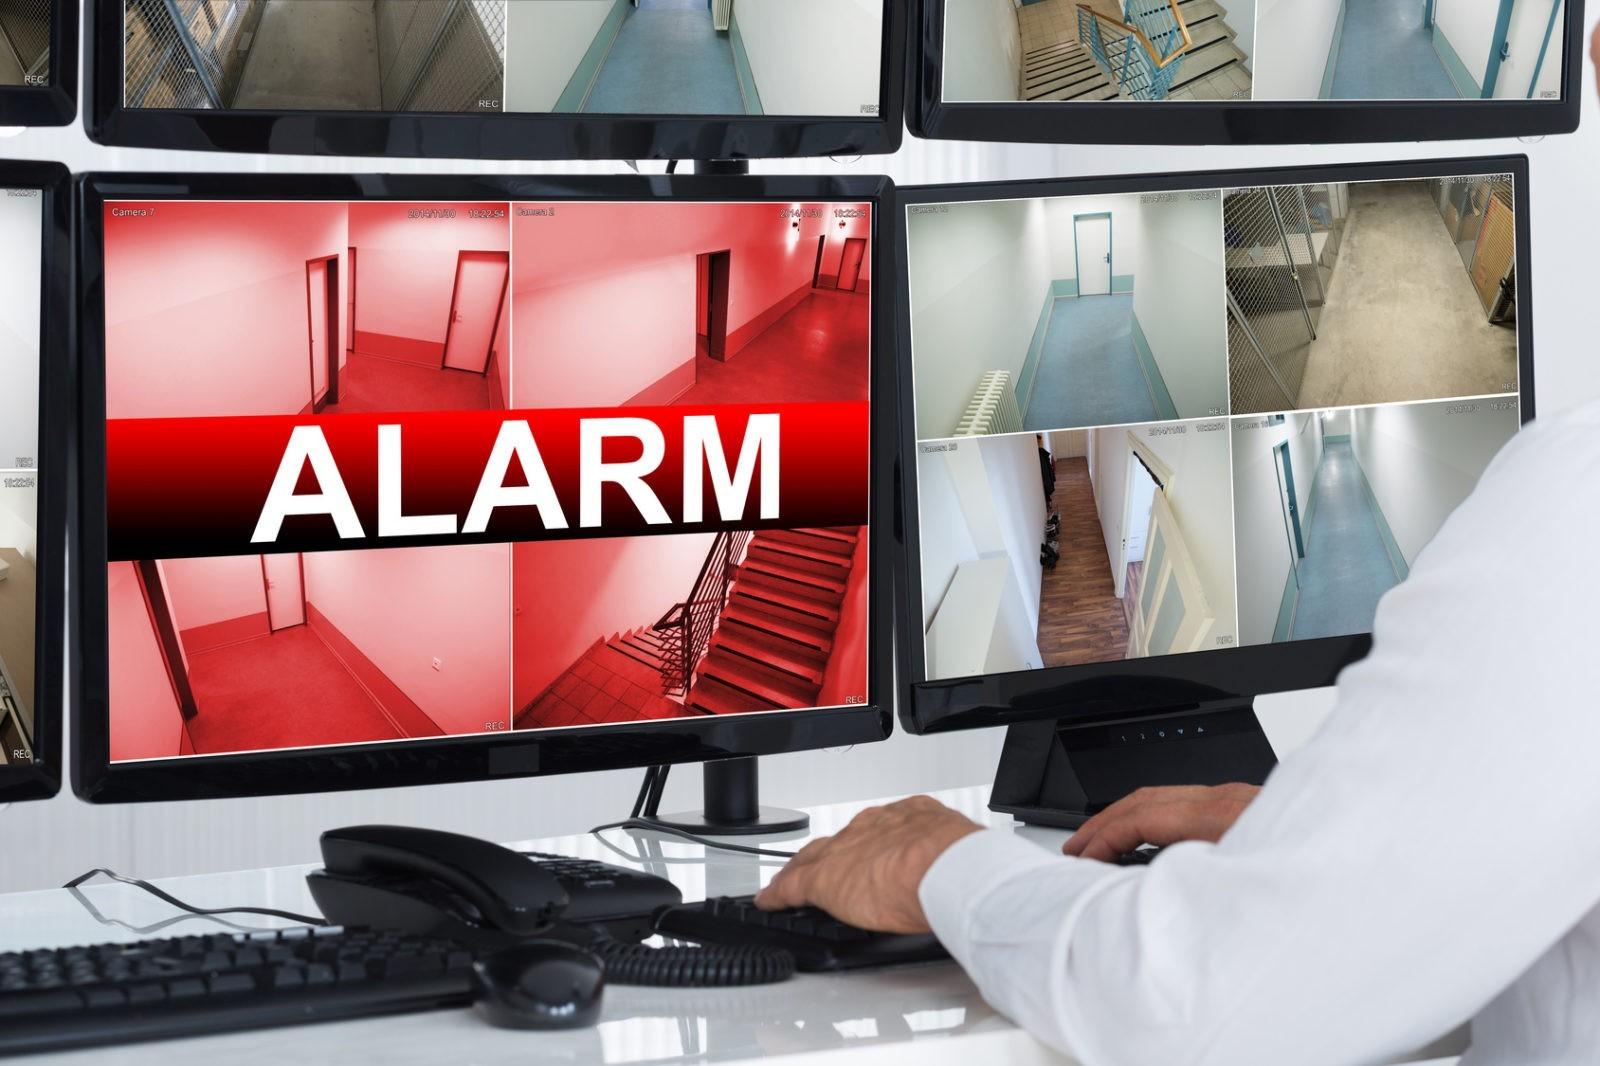 Procedury obsługi alarmów monitoring alarmów